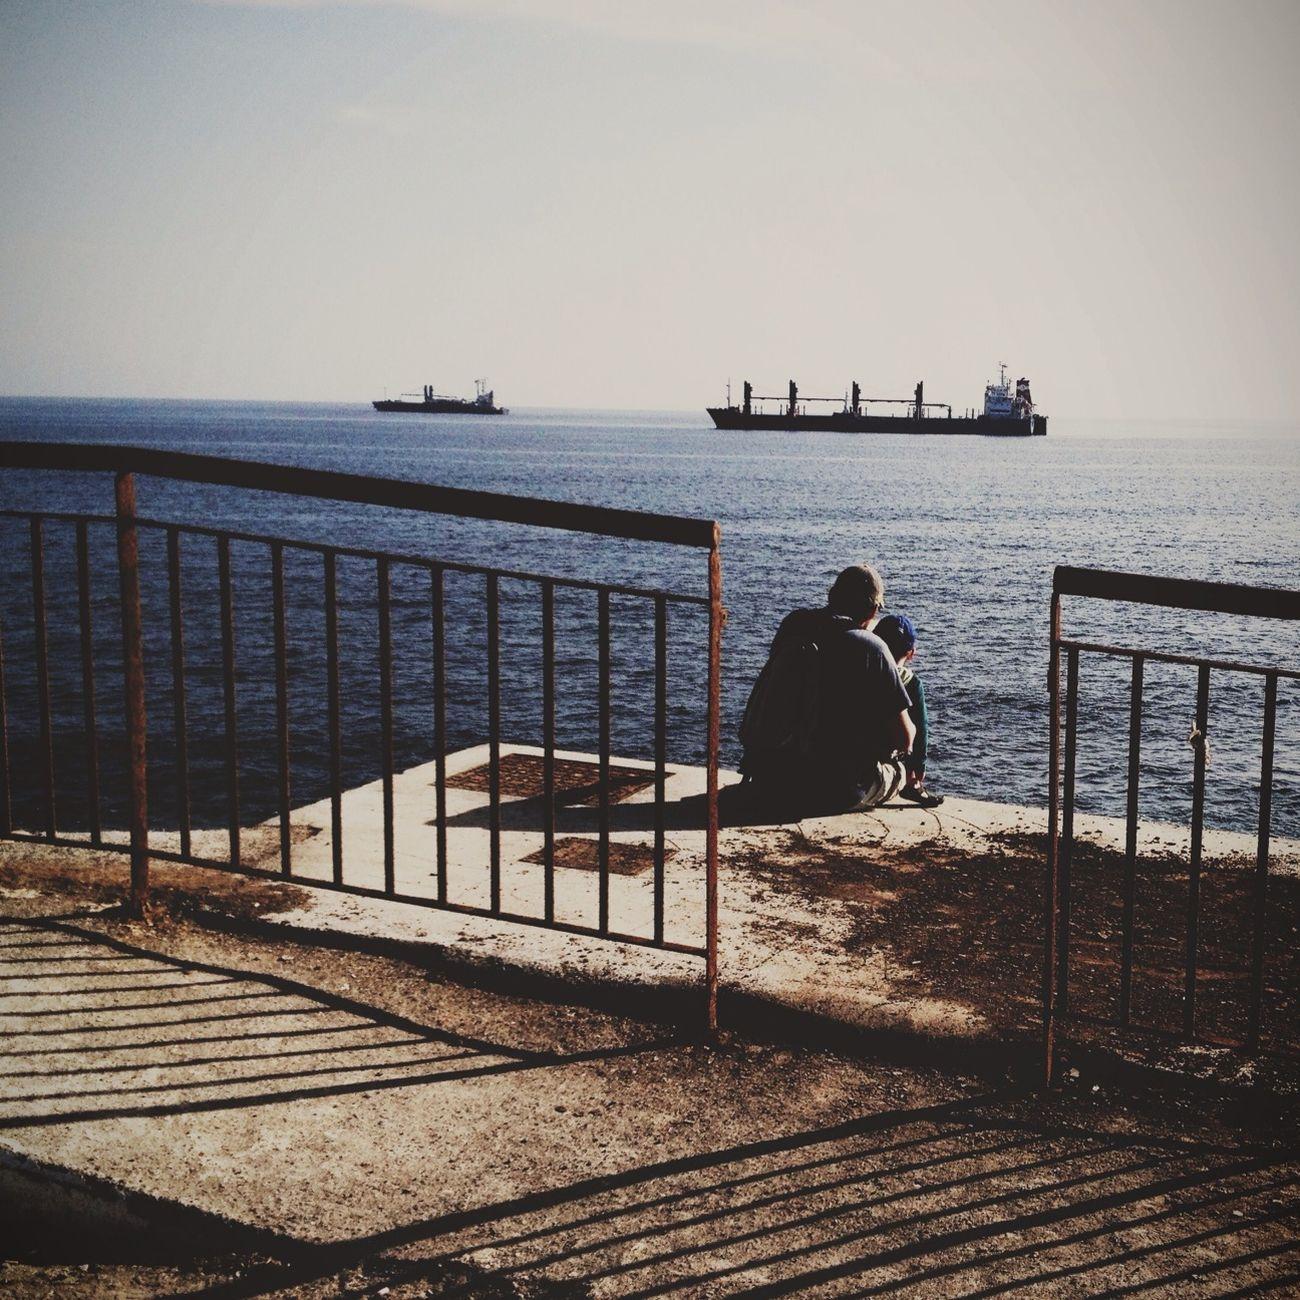 Streetphotography Behindthefence